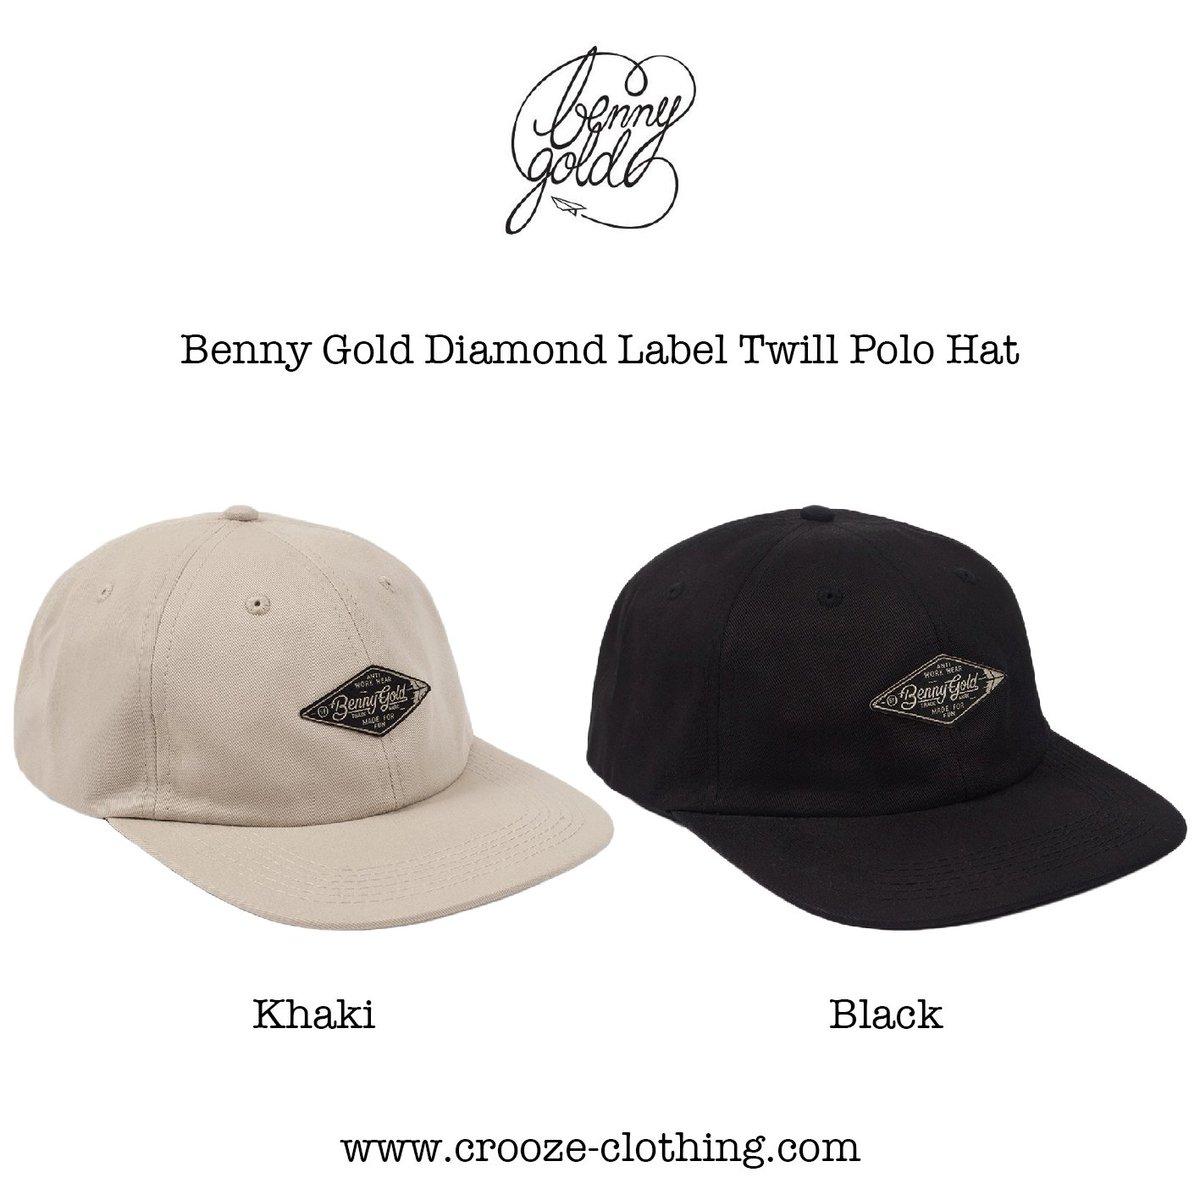 d14dd089bcd Benny Gold Diamond Label Twill Polo Hat - Online  http   www.crooze-clothing.com  営業時間  平日 14 00-21 00 週末 13 00-21 00   bennygold  sanfrancisco ...